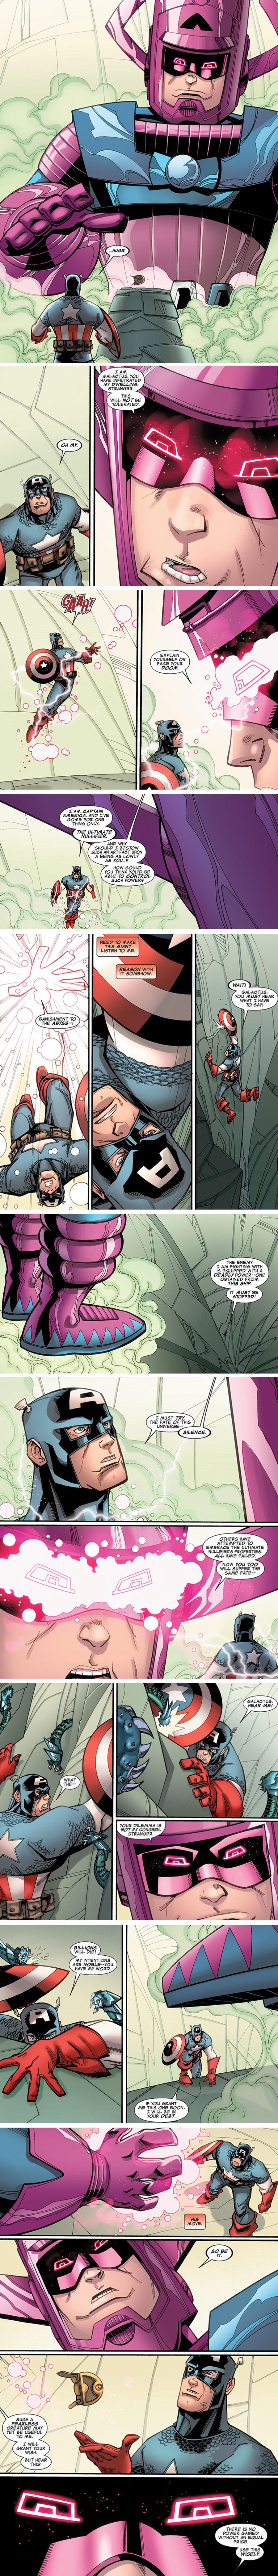 "Captain America & the Korvac Saga #4 - ""The Star Lord"" (2011)"